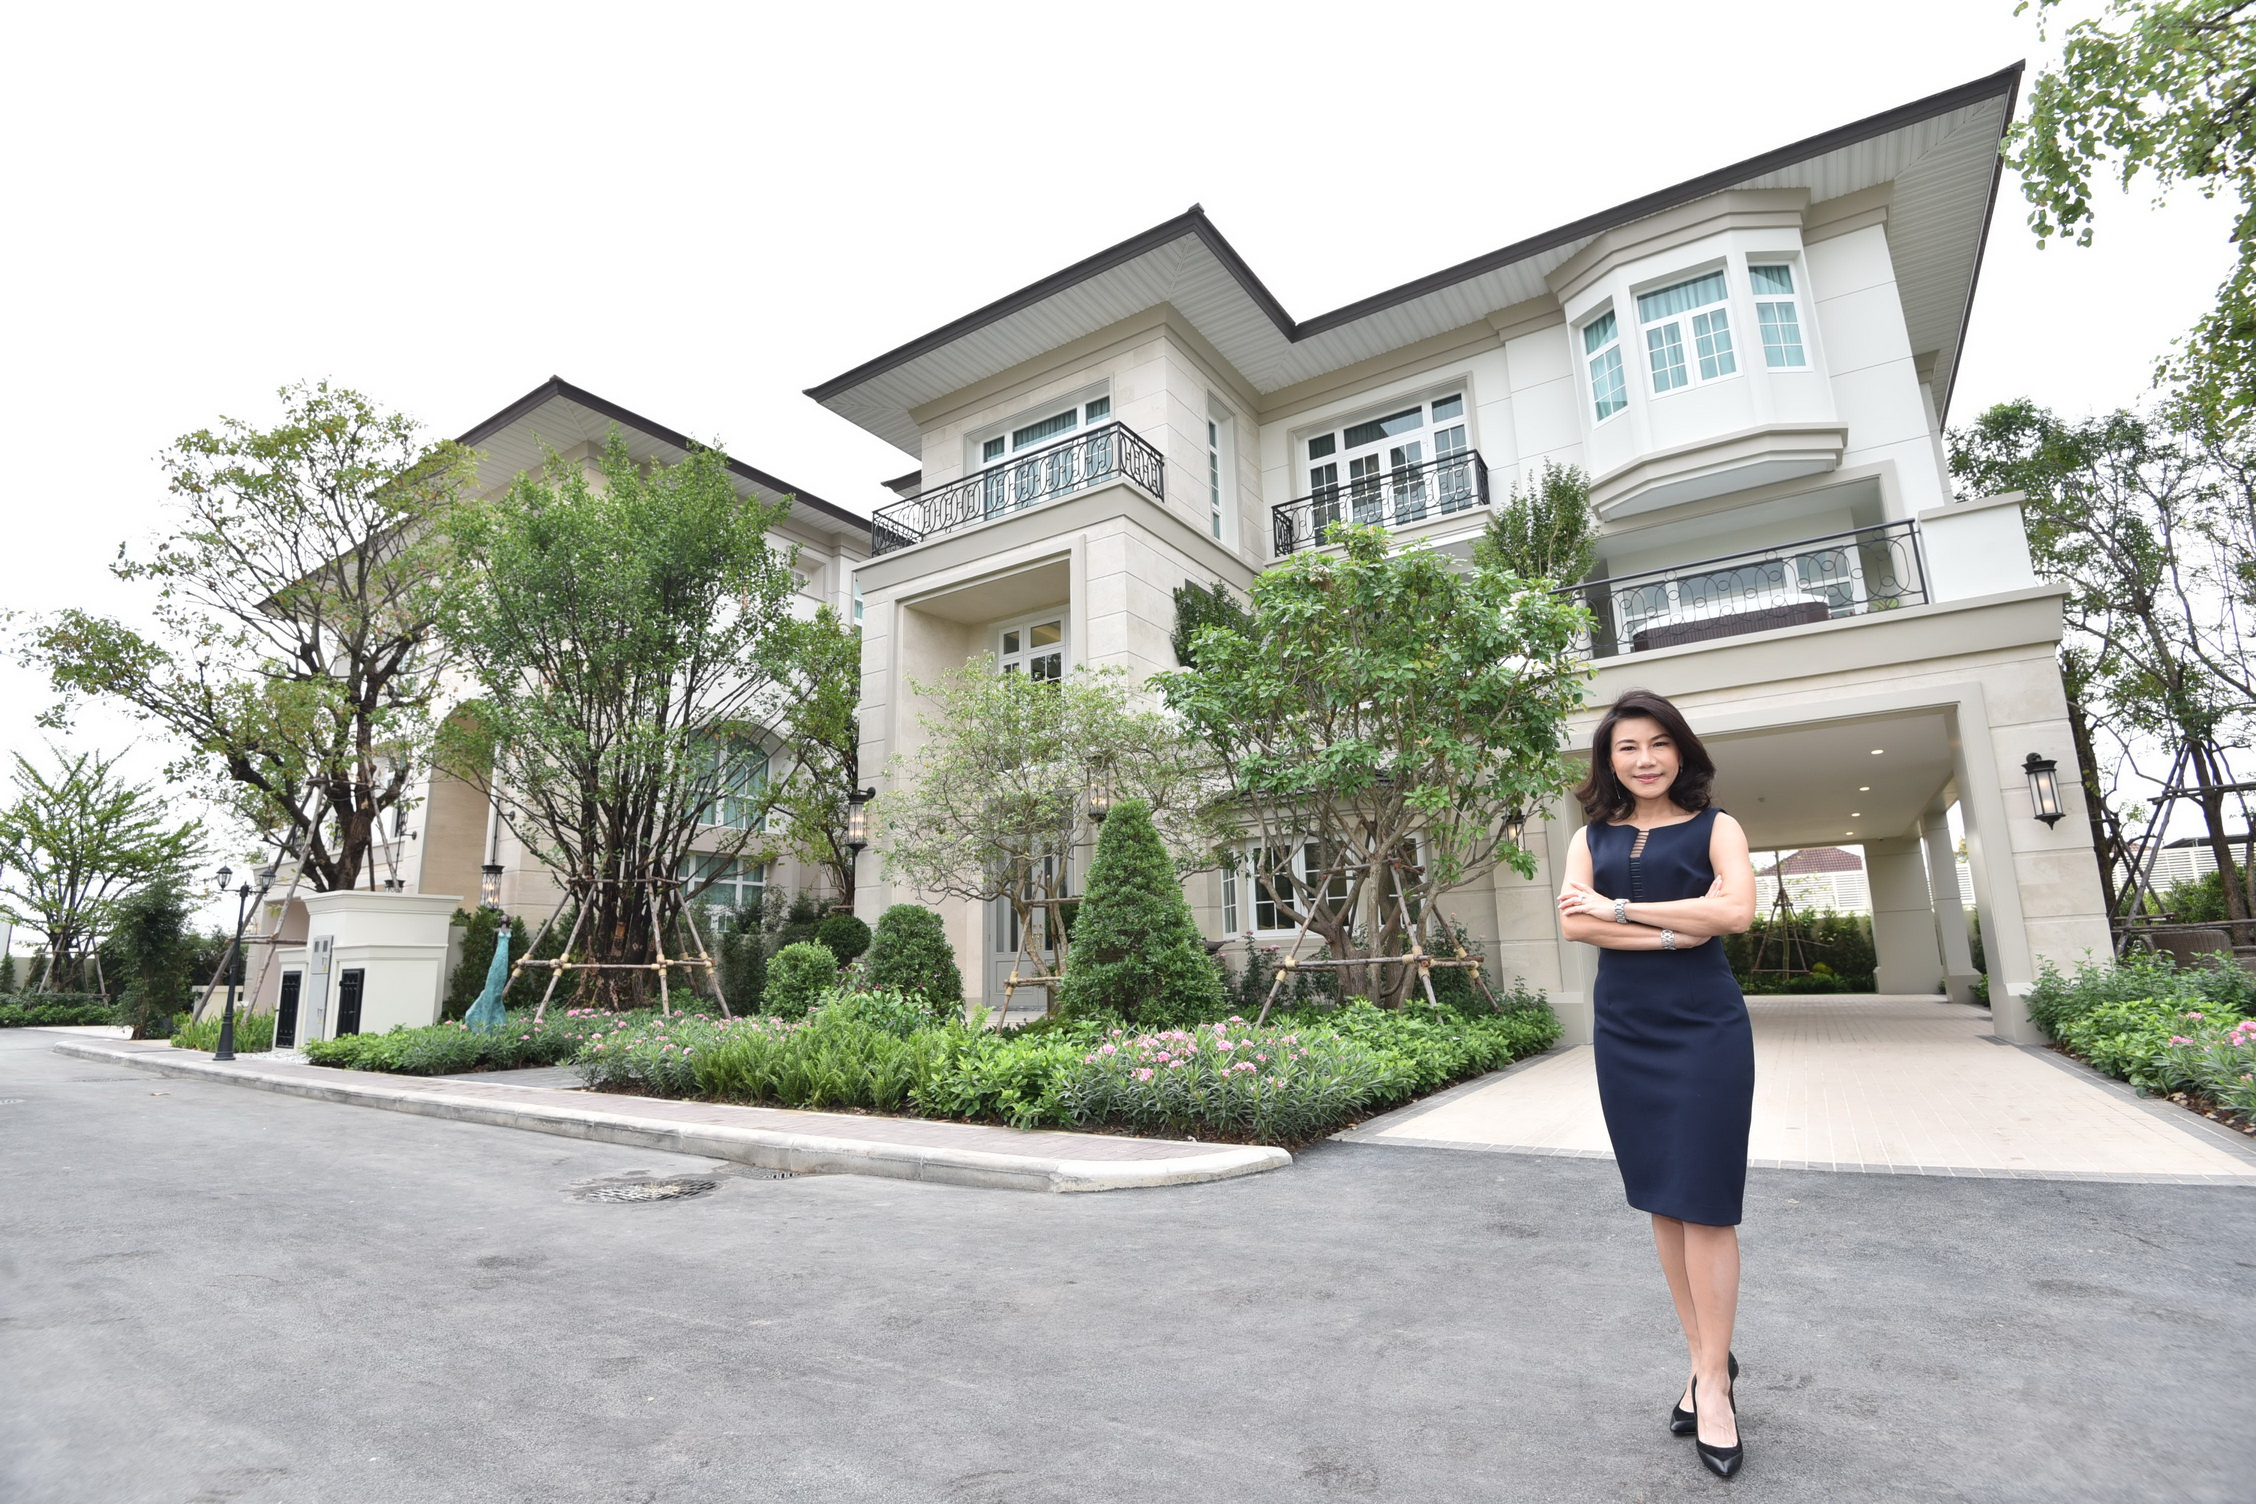 Crystal Solana บ้านเดี่ยวระดับ 6 ดาว จาก K.E. Group มูลค่าโครงการกว่า 4,500 ลบ.